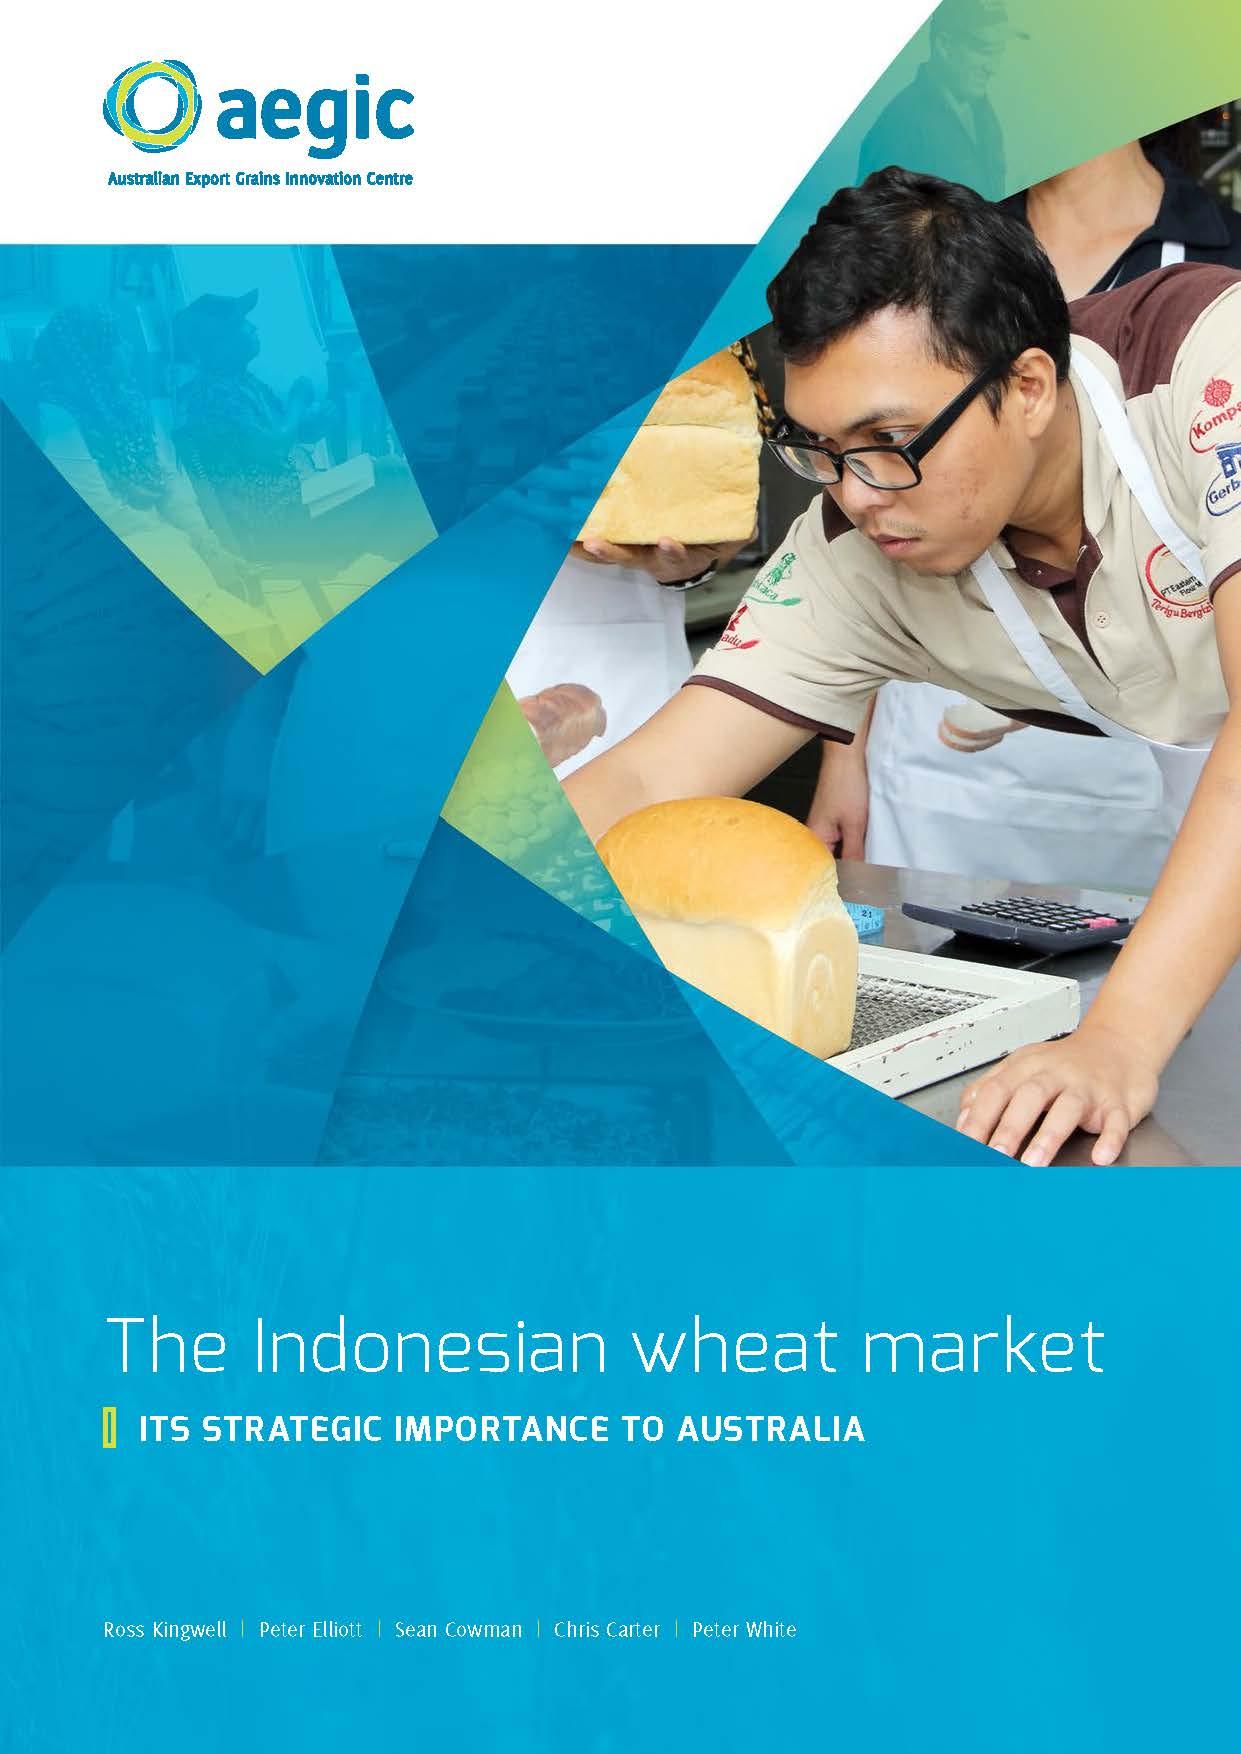 The Indonesian wheat market - its strategic importance to Australia